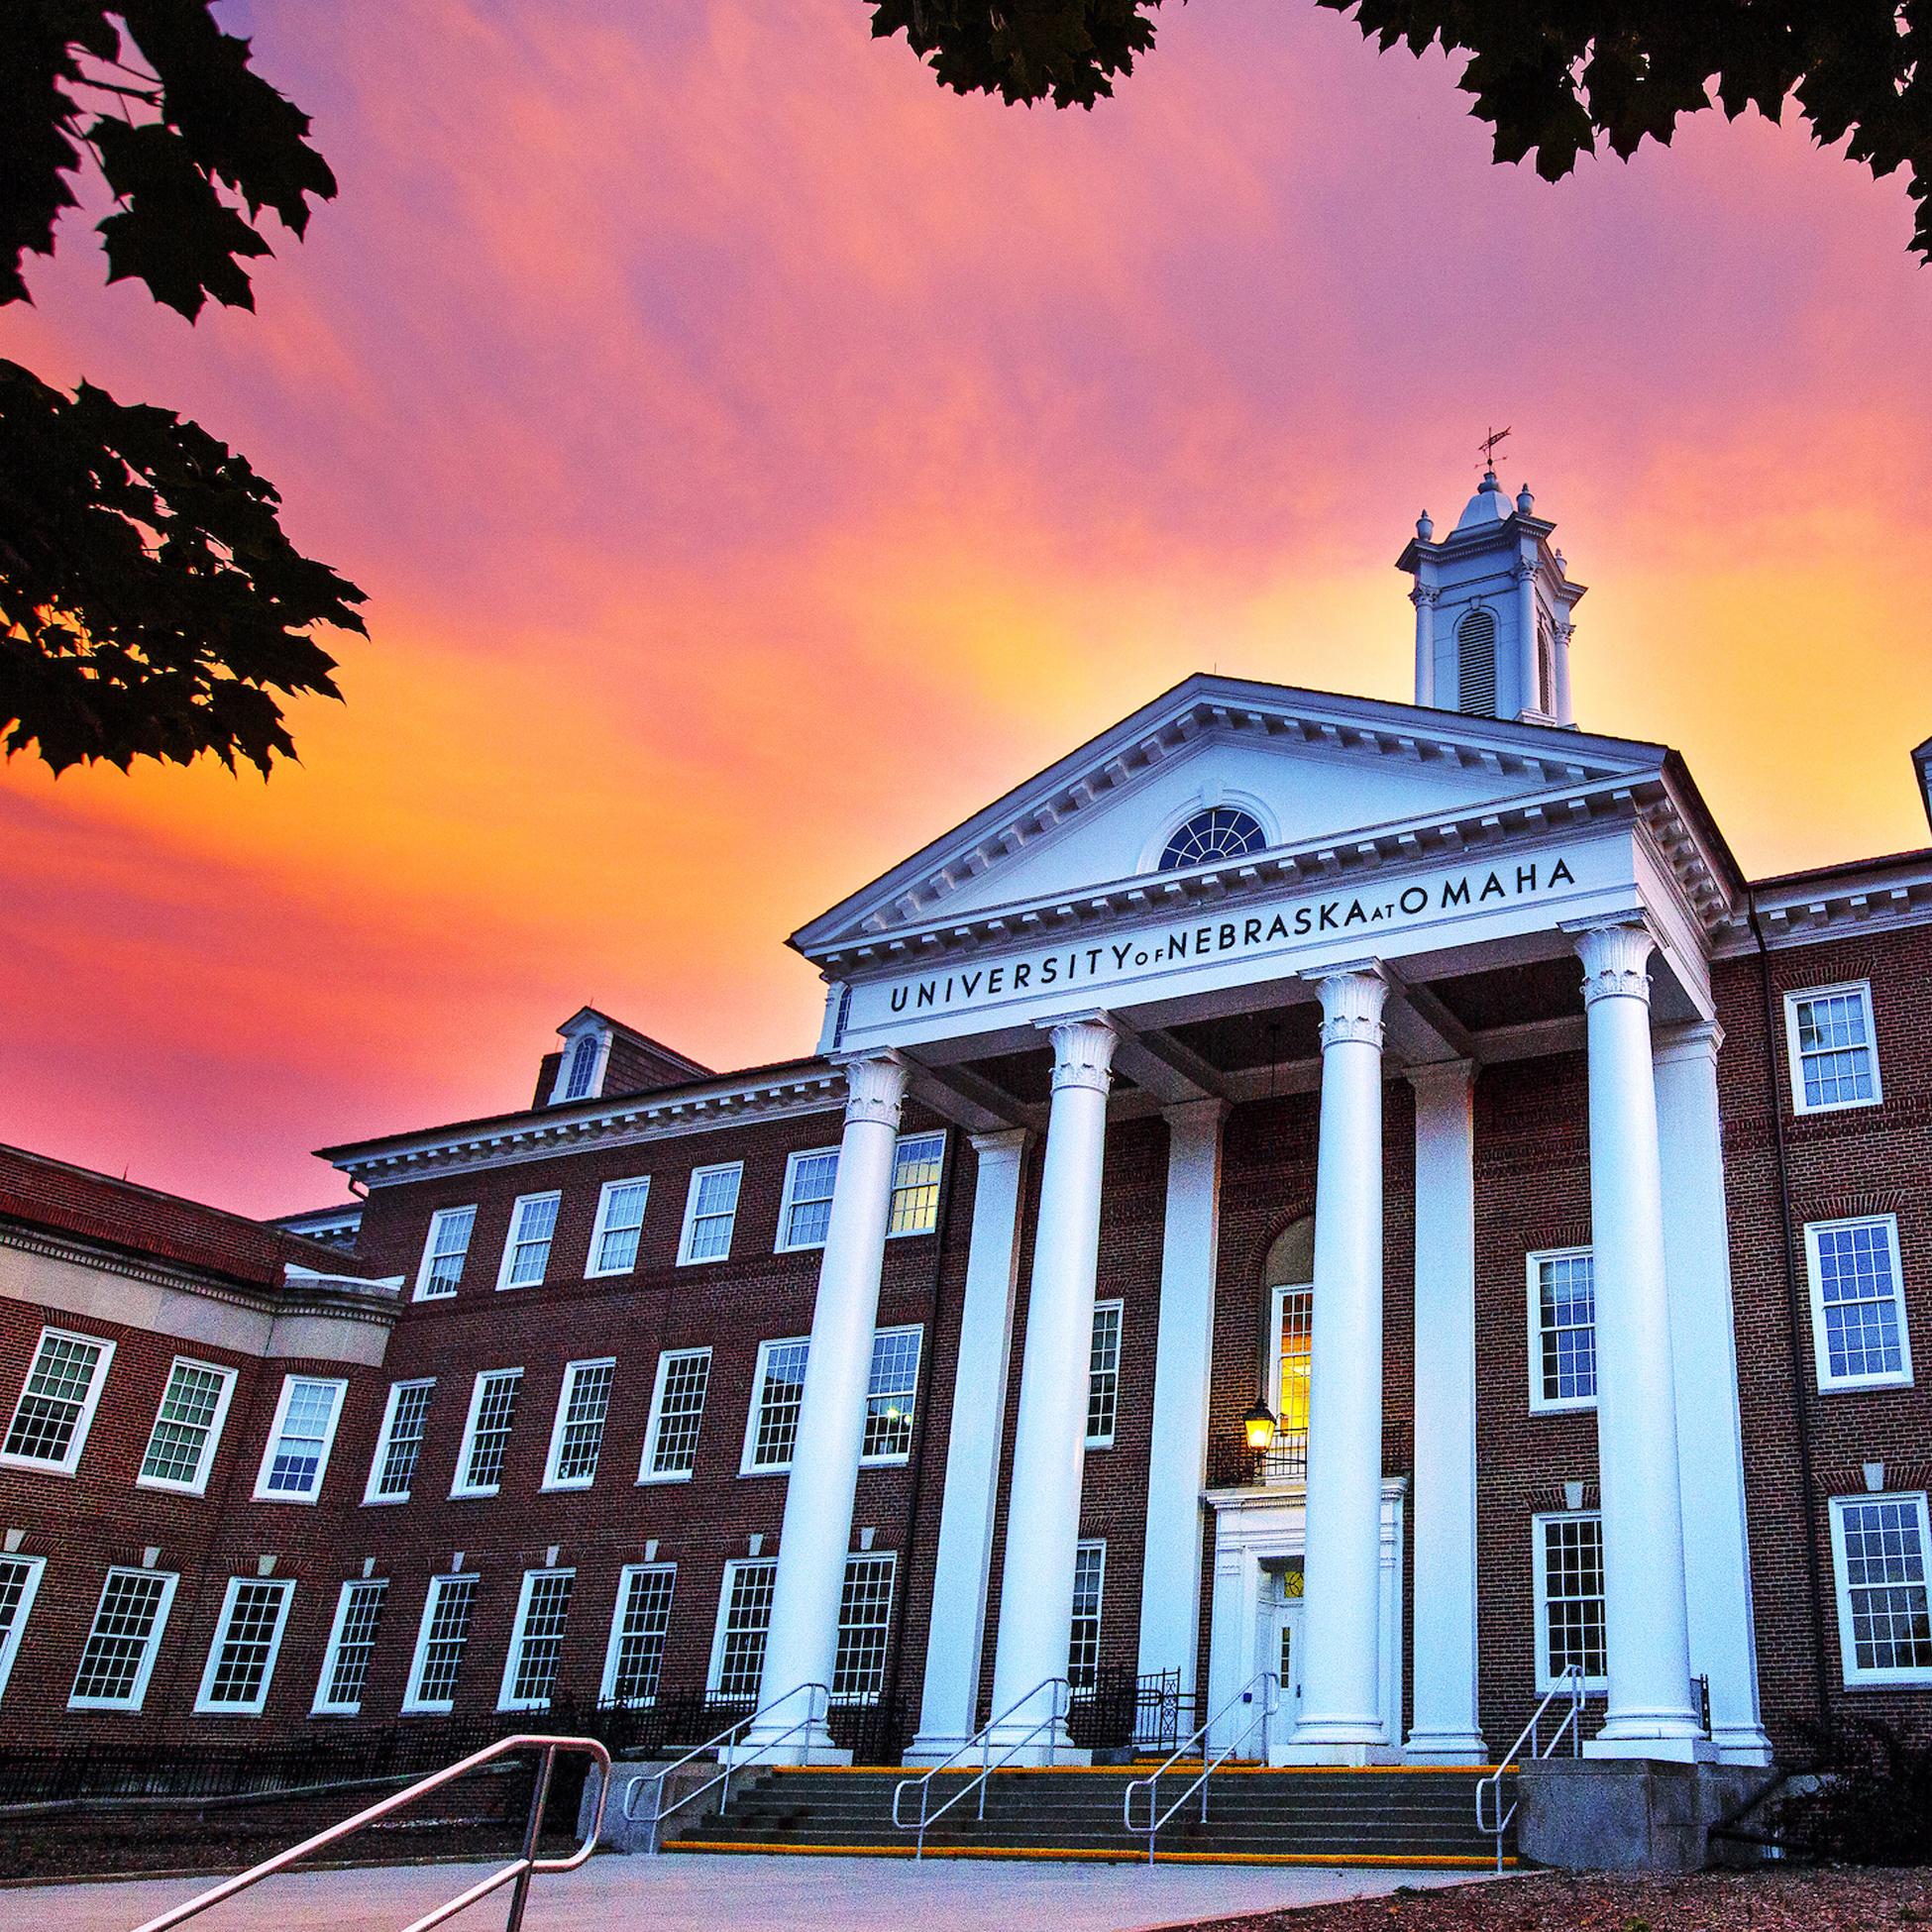 UNO Arts & Science Hall Deadline: Sept. 21